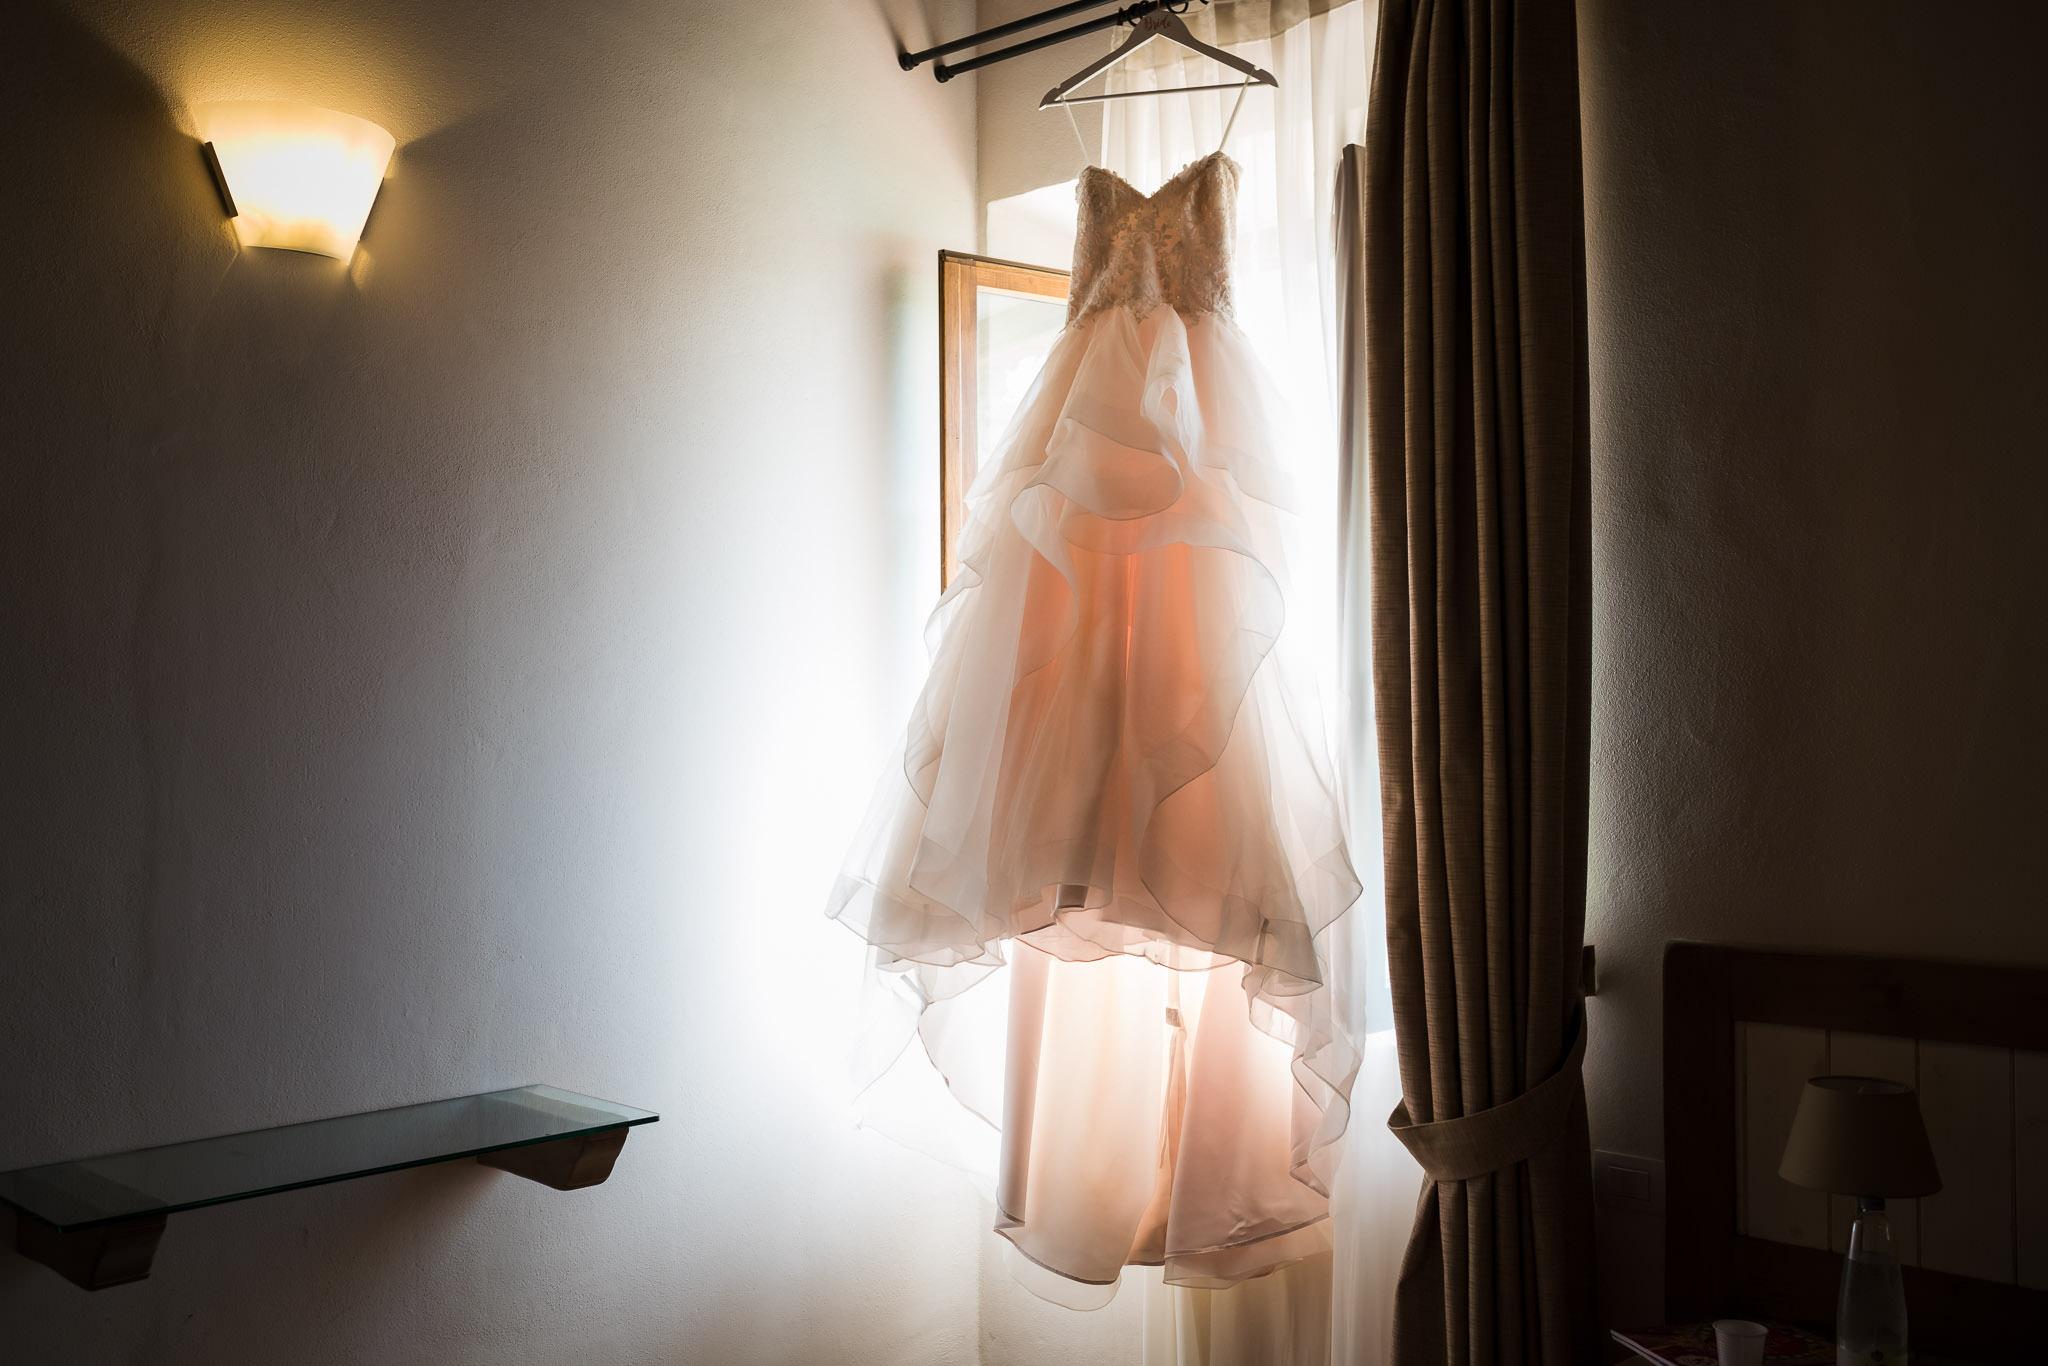 NC-2018-09-07_gemma-and-steve-wedding-2561.jpg